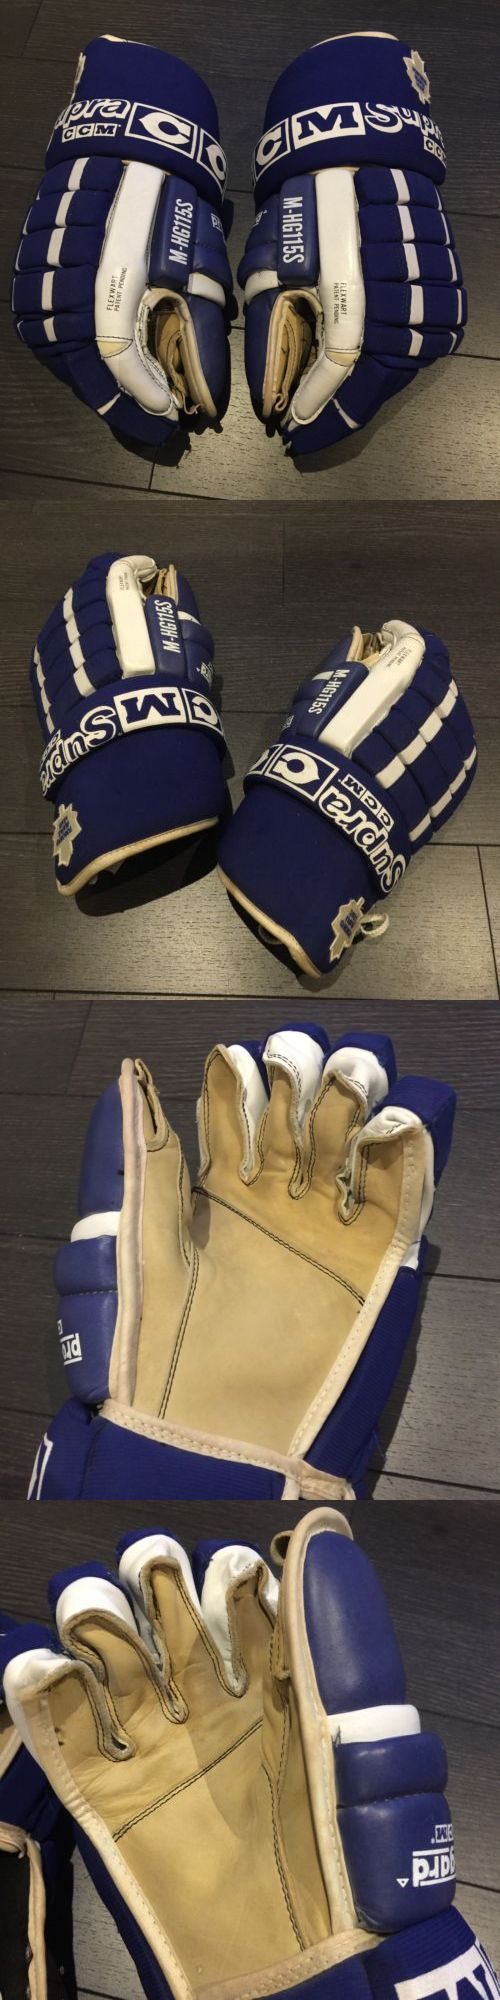 Gloves 20853: Ccm Supra Toronto Maple Leafs Nhl Pro Stock Hockey Gloves L Large Vtg -> BUY IT NOW ONLY: $299.99 on eBay!